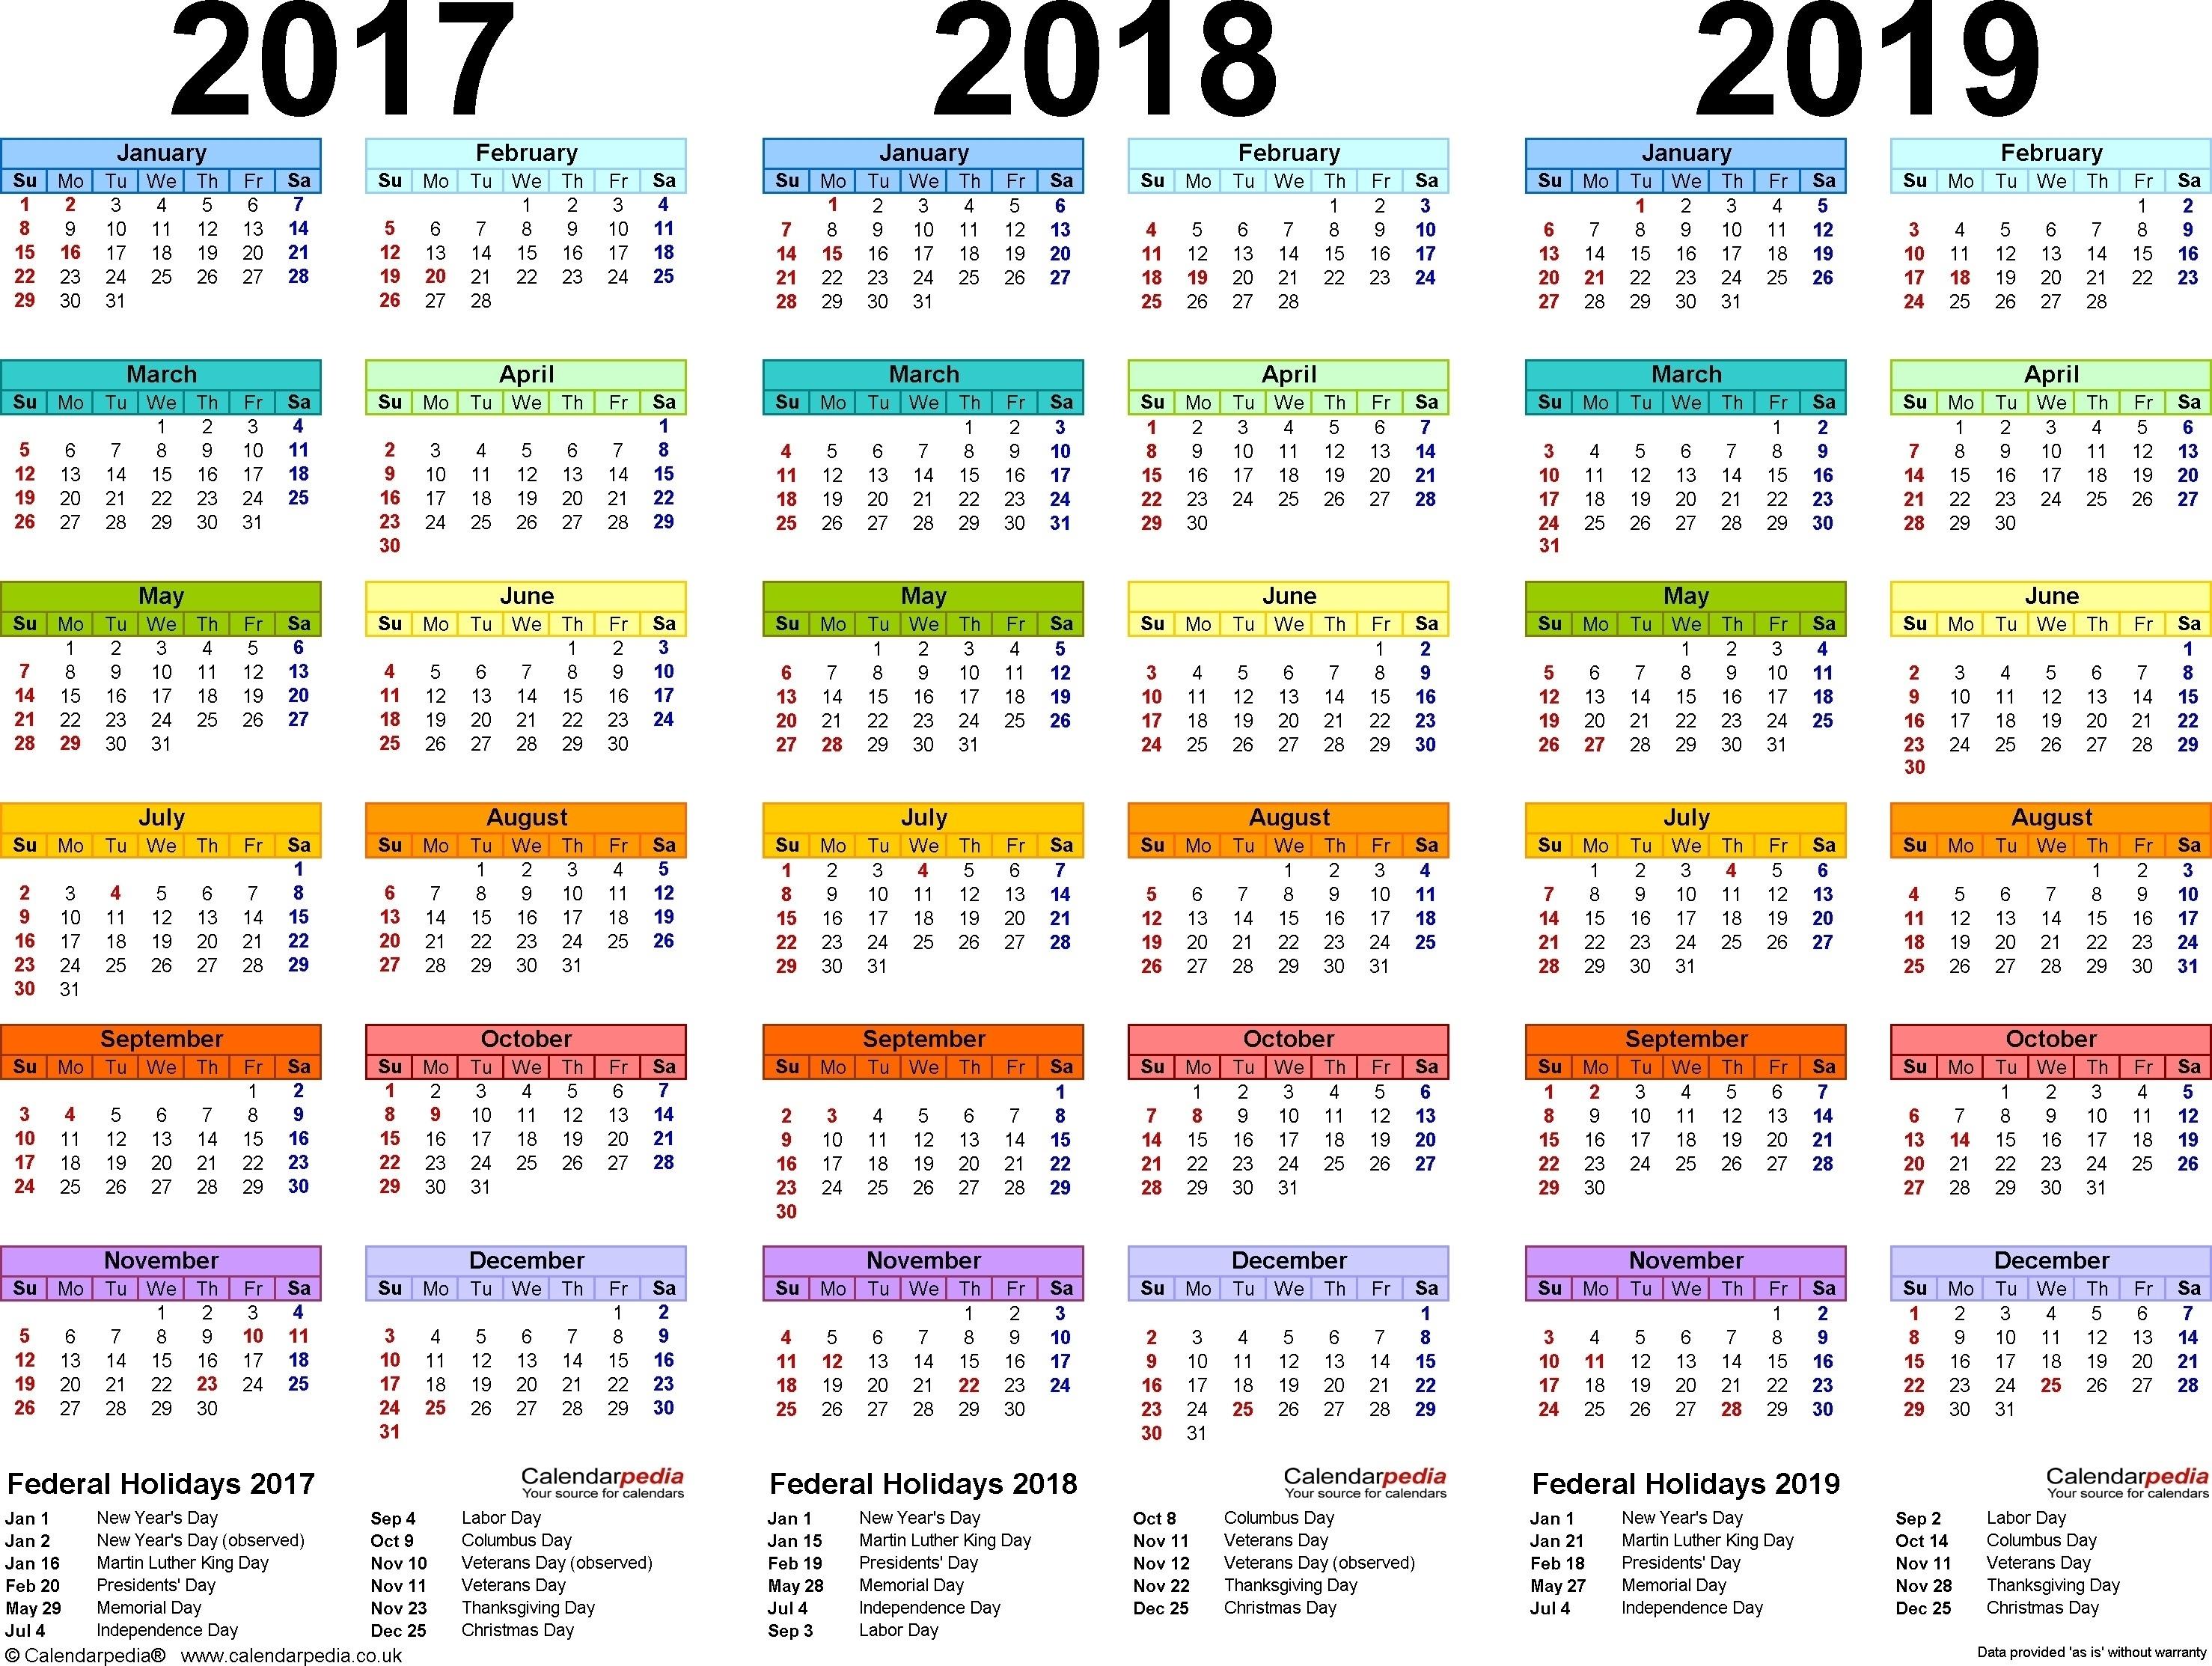 Depo Schedule Chart - Koskin  Depo Protocol Perpetual Calendar 2020